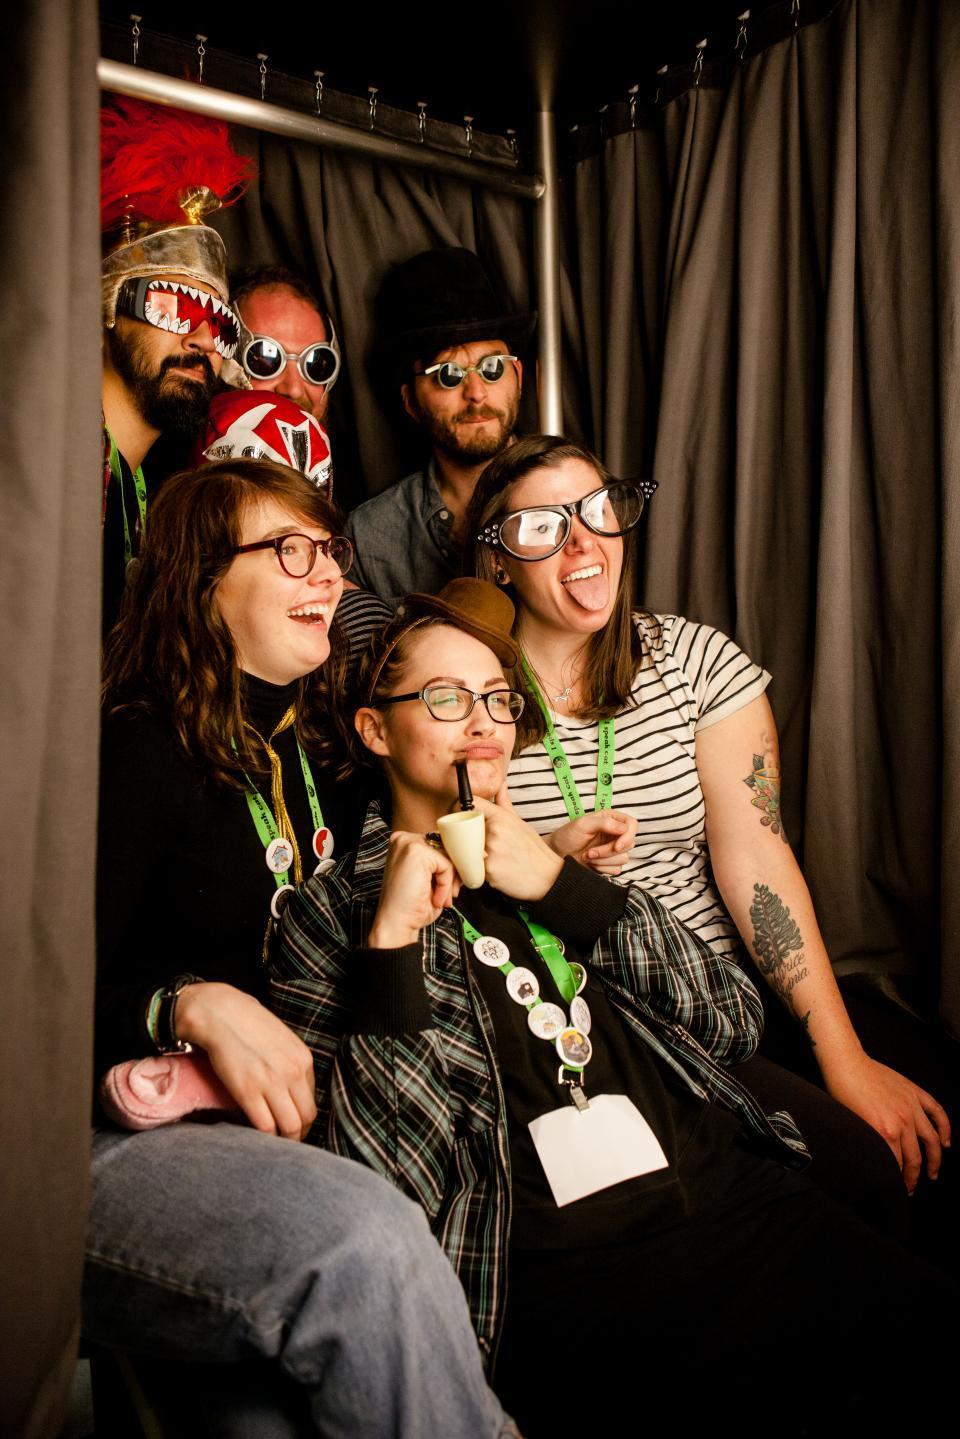 Photobooth fun at Mudstock 2016